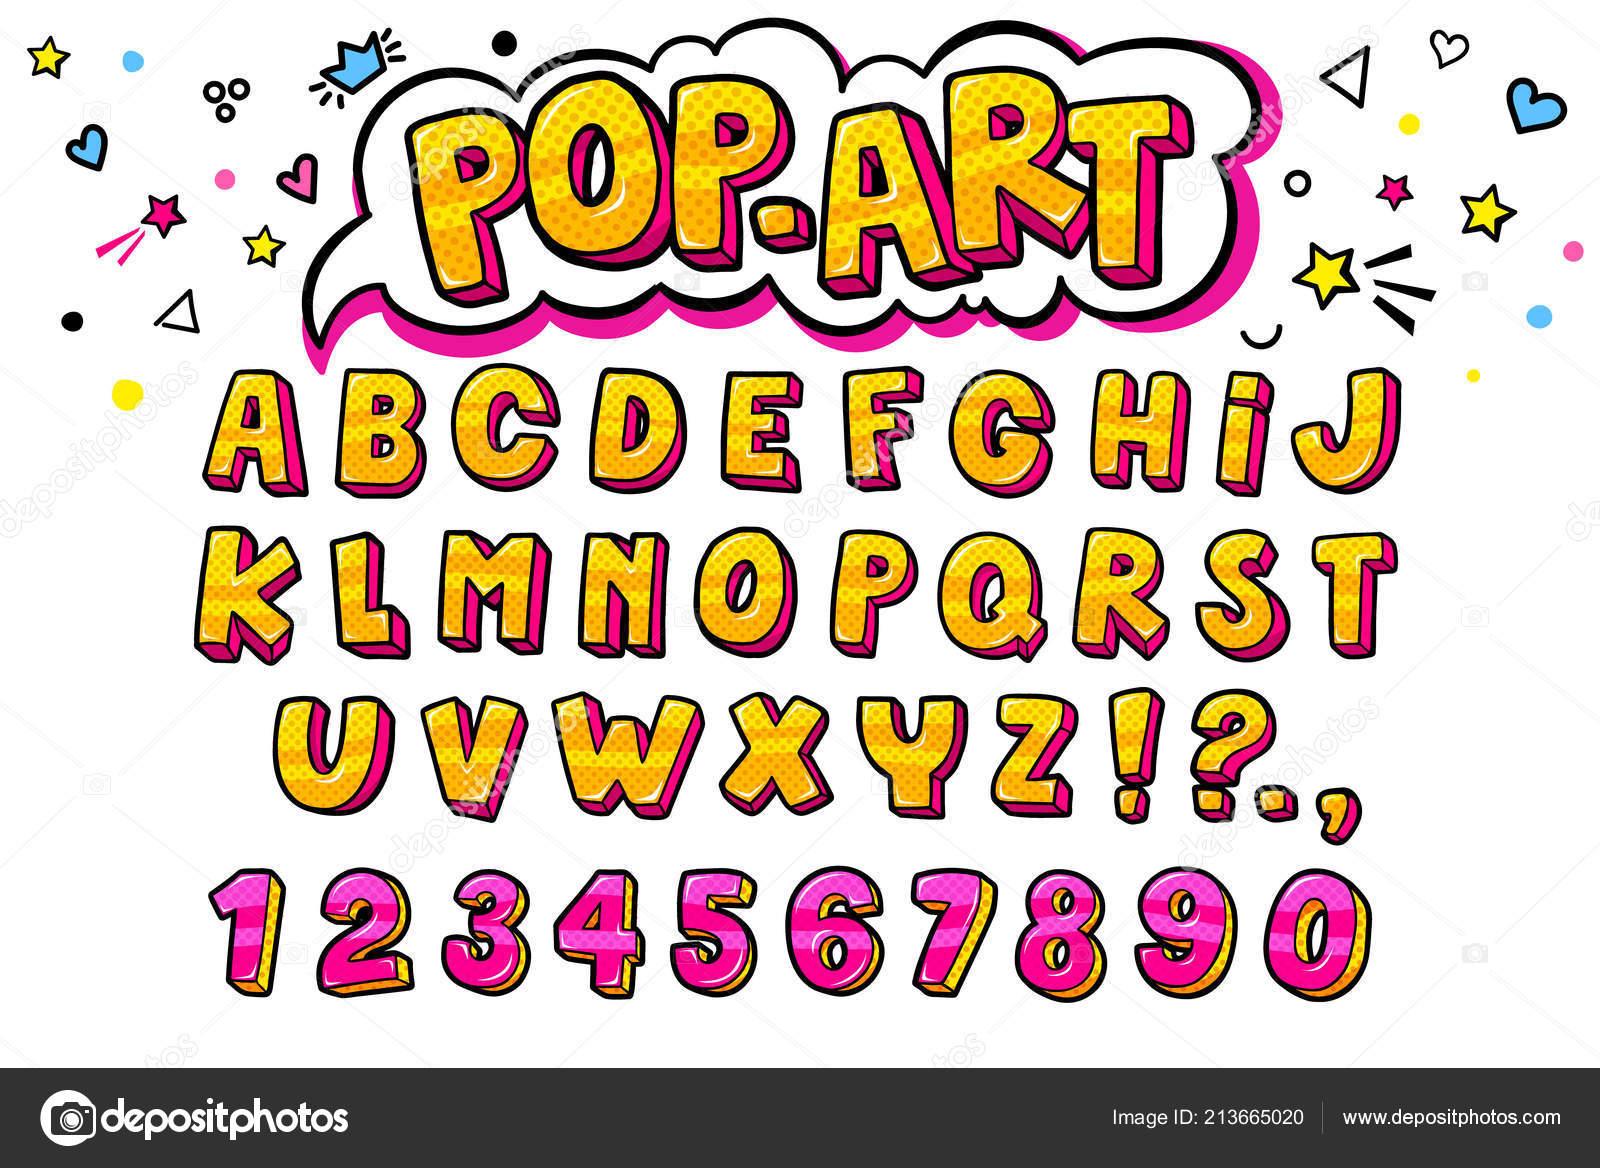 images?q=tbn:ANd9GcQh_l3eQ5xwiPy07kGEXjmjgmBKBRB7H2mRxCGhv1tFWg5c_mWT Trends For Pop Art Letters @koolgadgetz.com.info